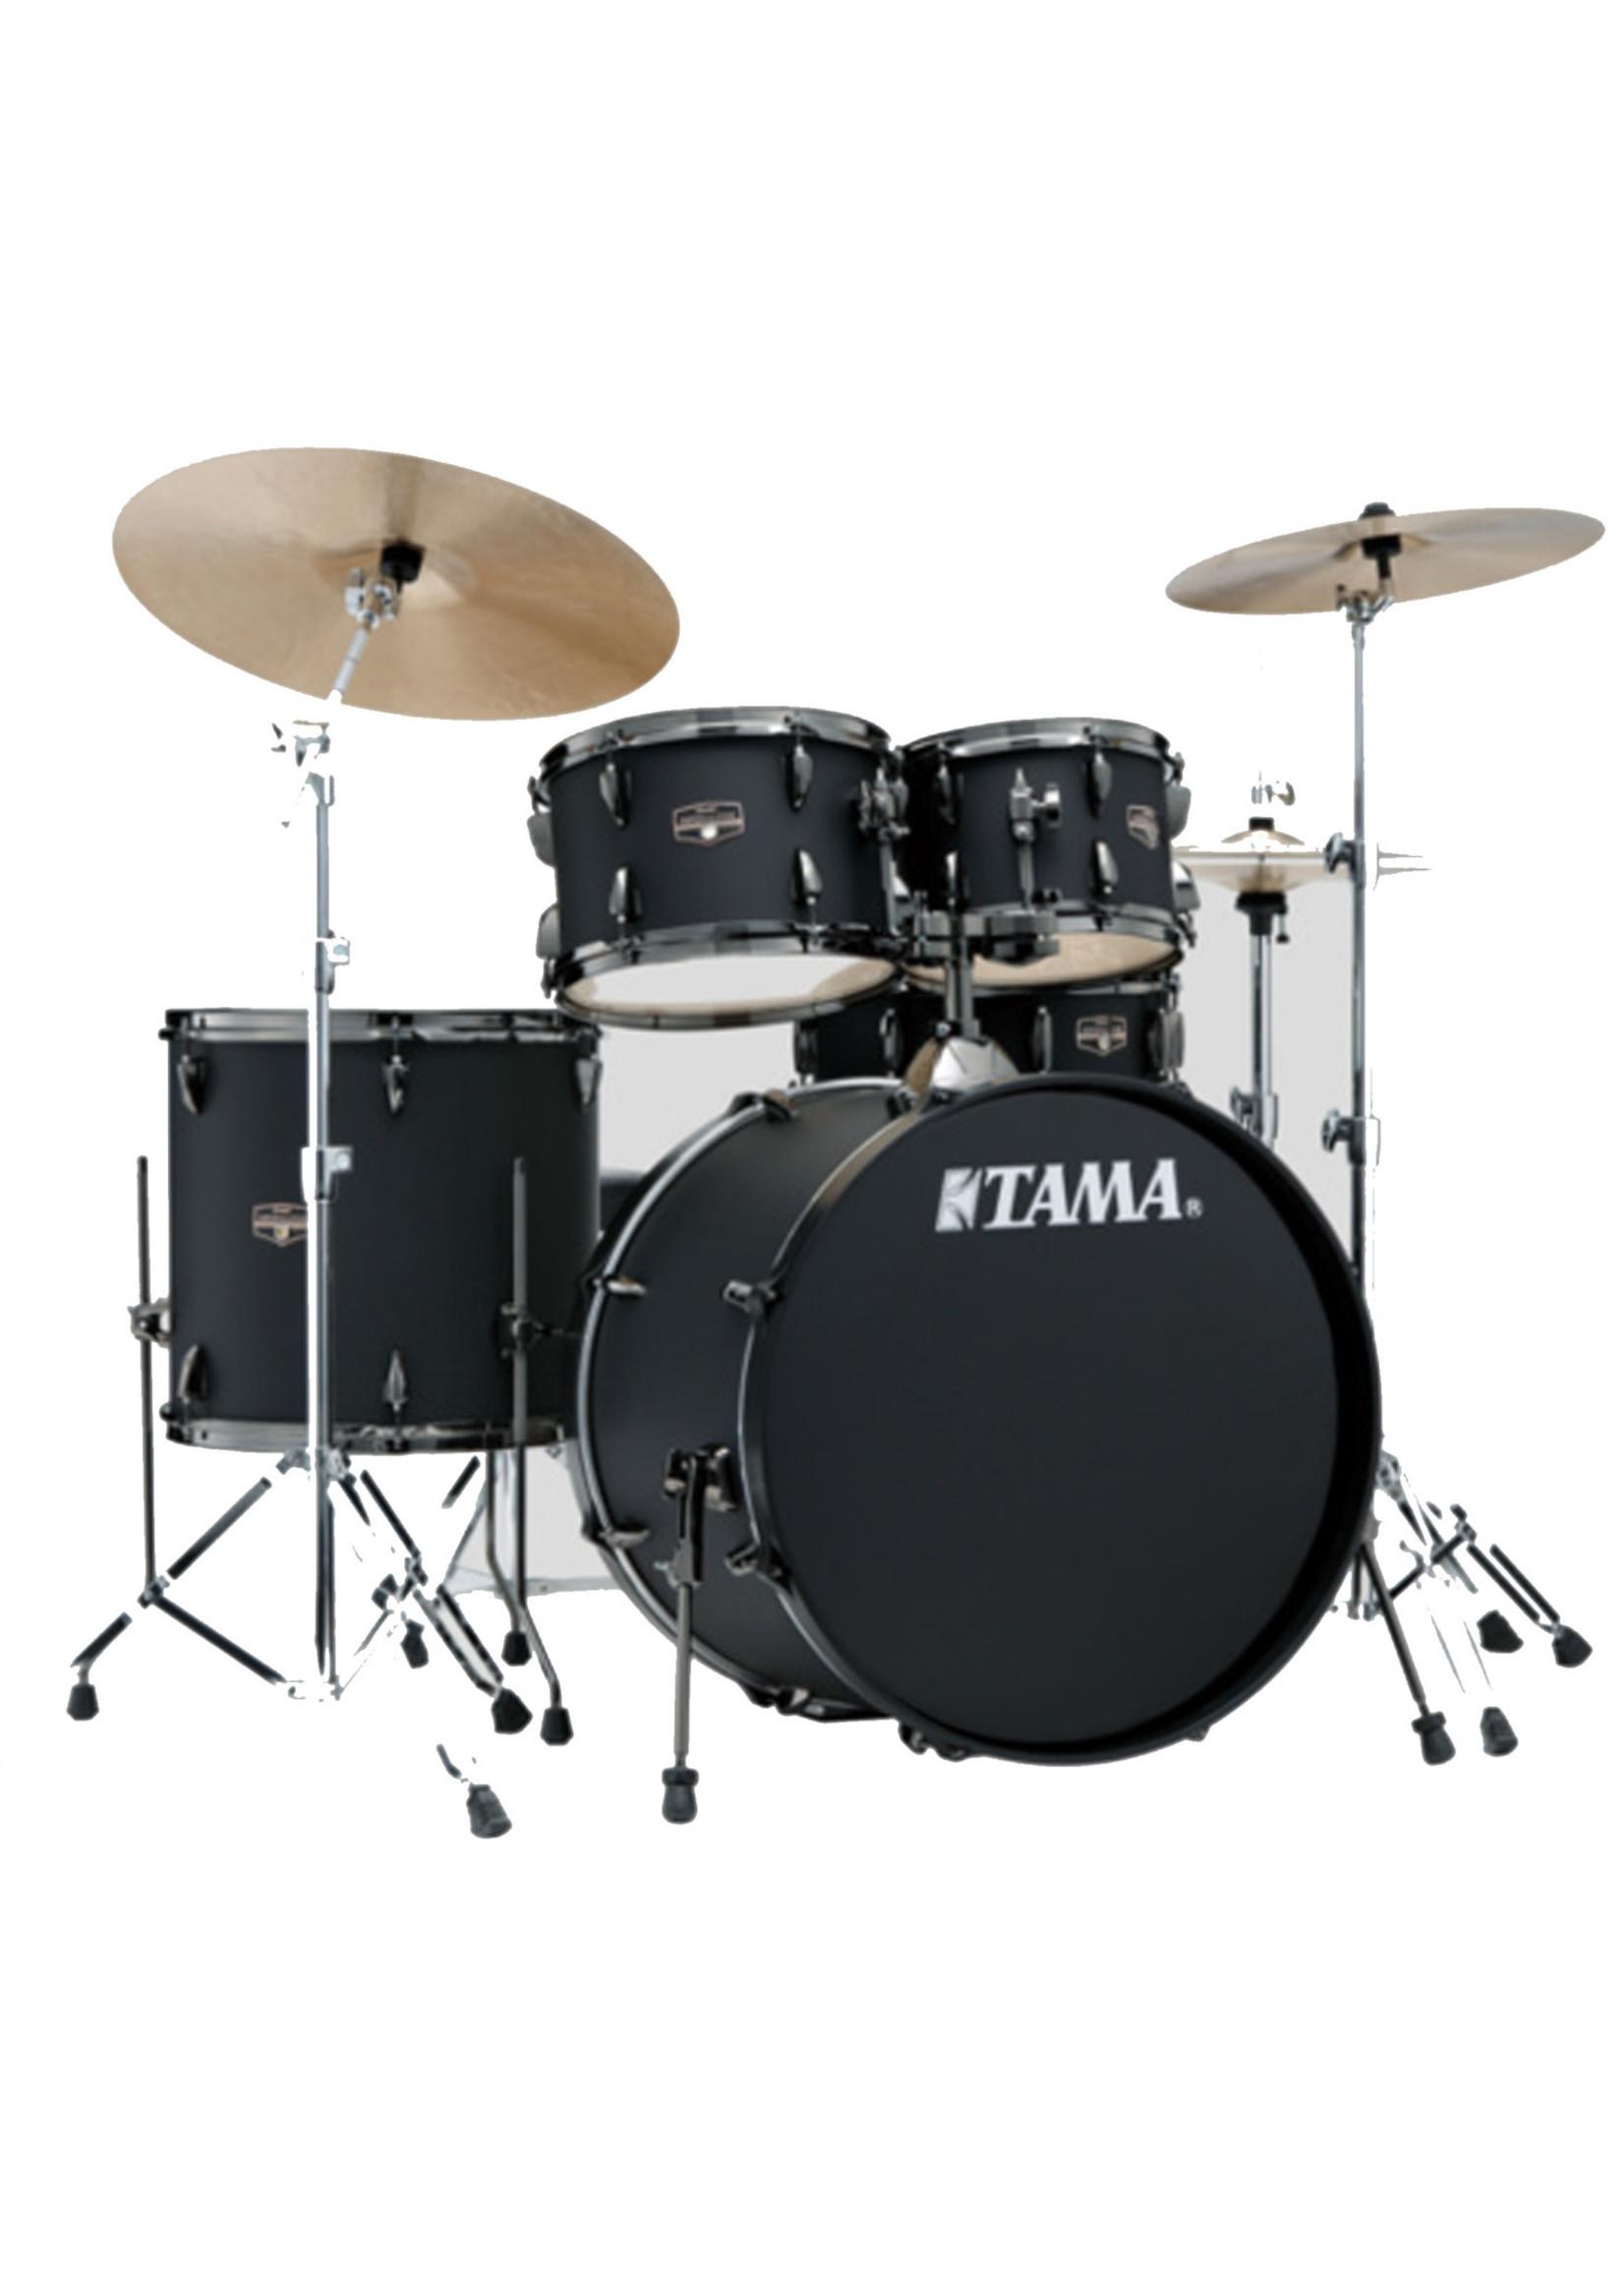 Tama Tama Imperialstar Limited Edition 5 Piece Black on Black